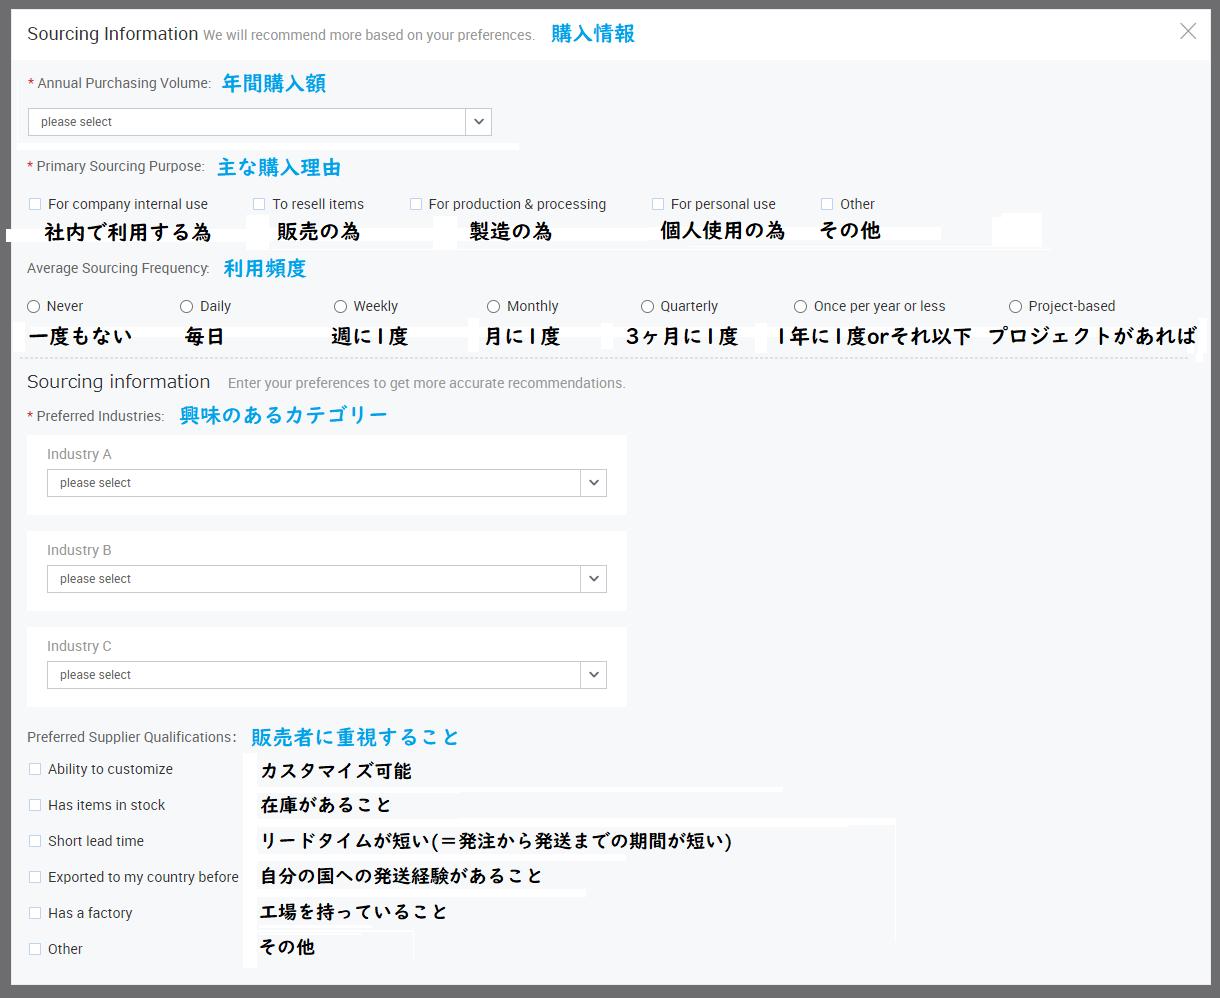 Alibaba.com 購入情報 プロフィール